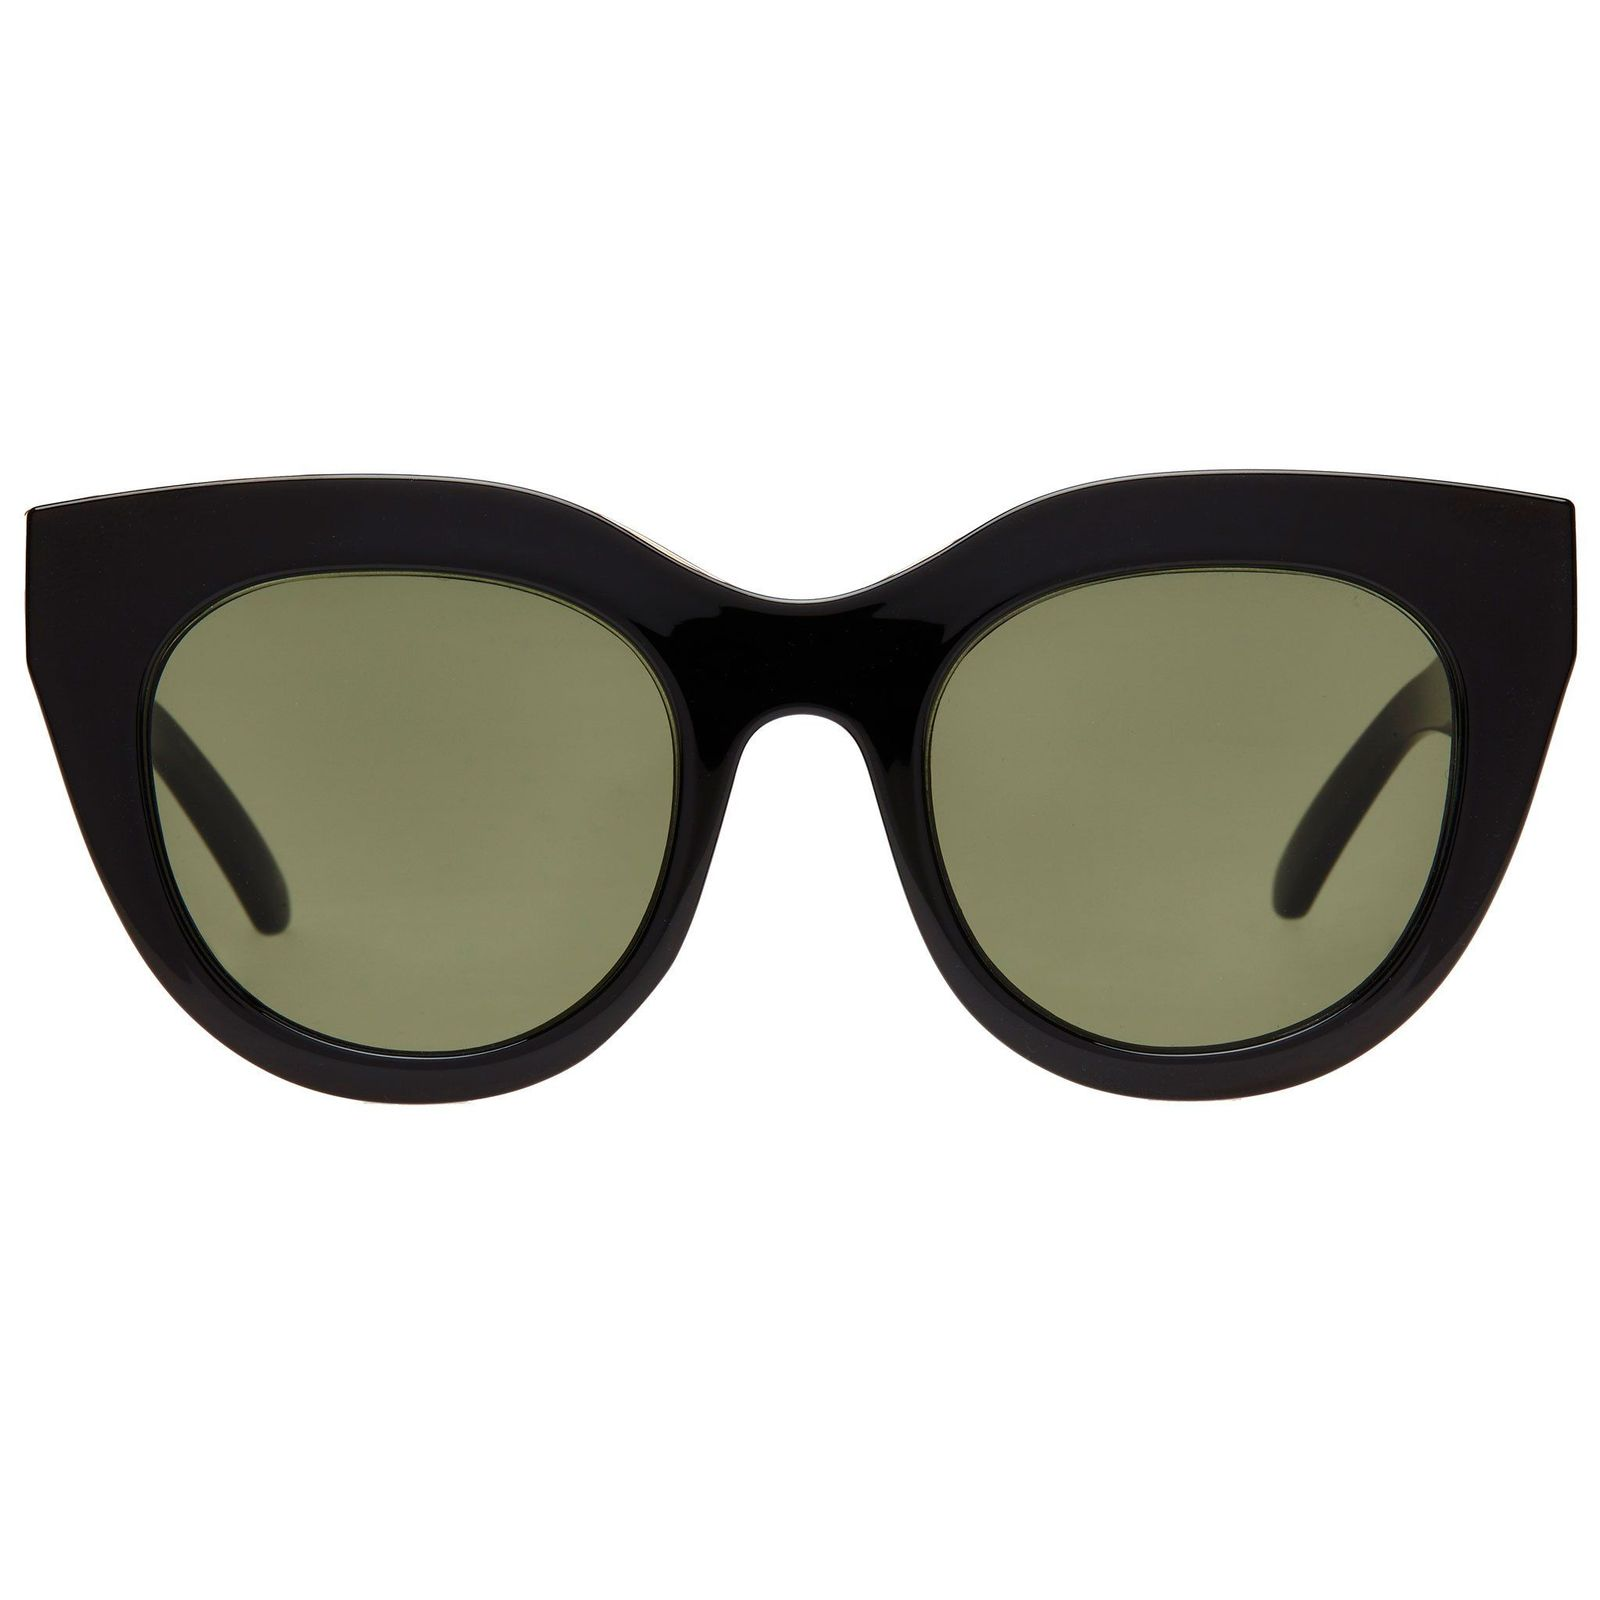 Le Specs- Air Heart- Black/Gold